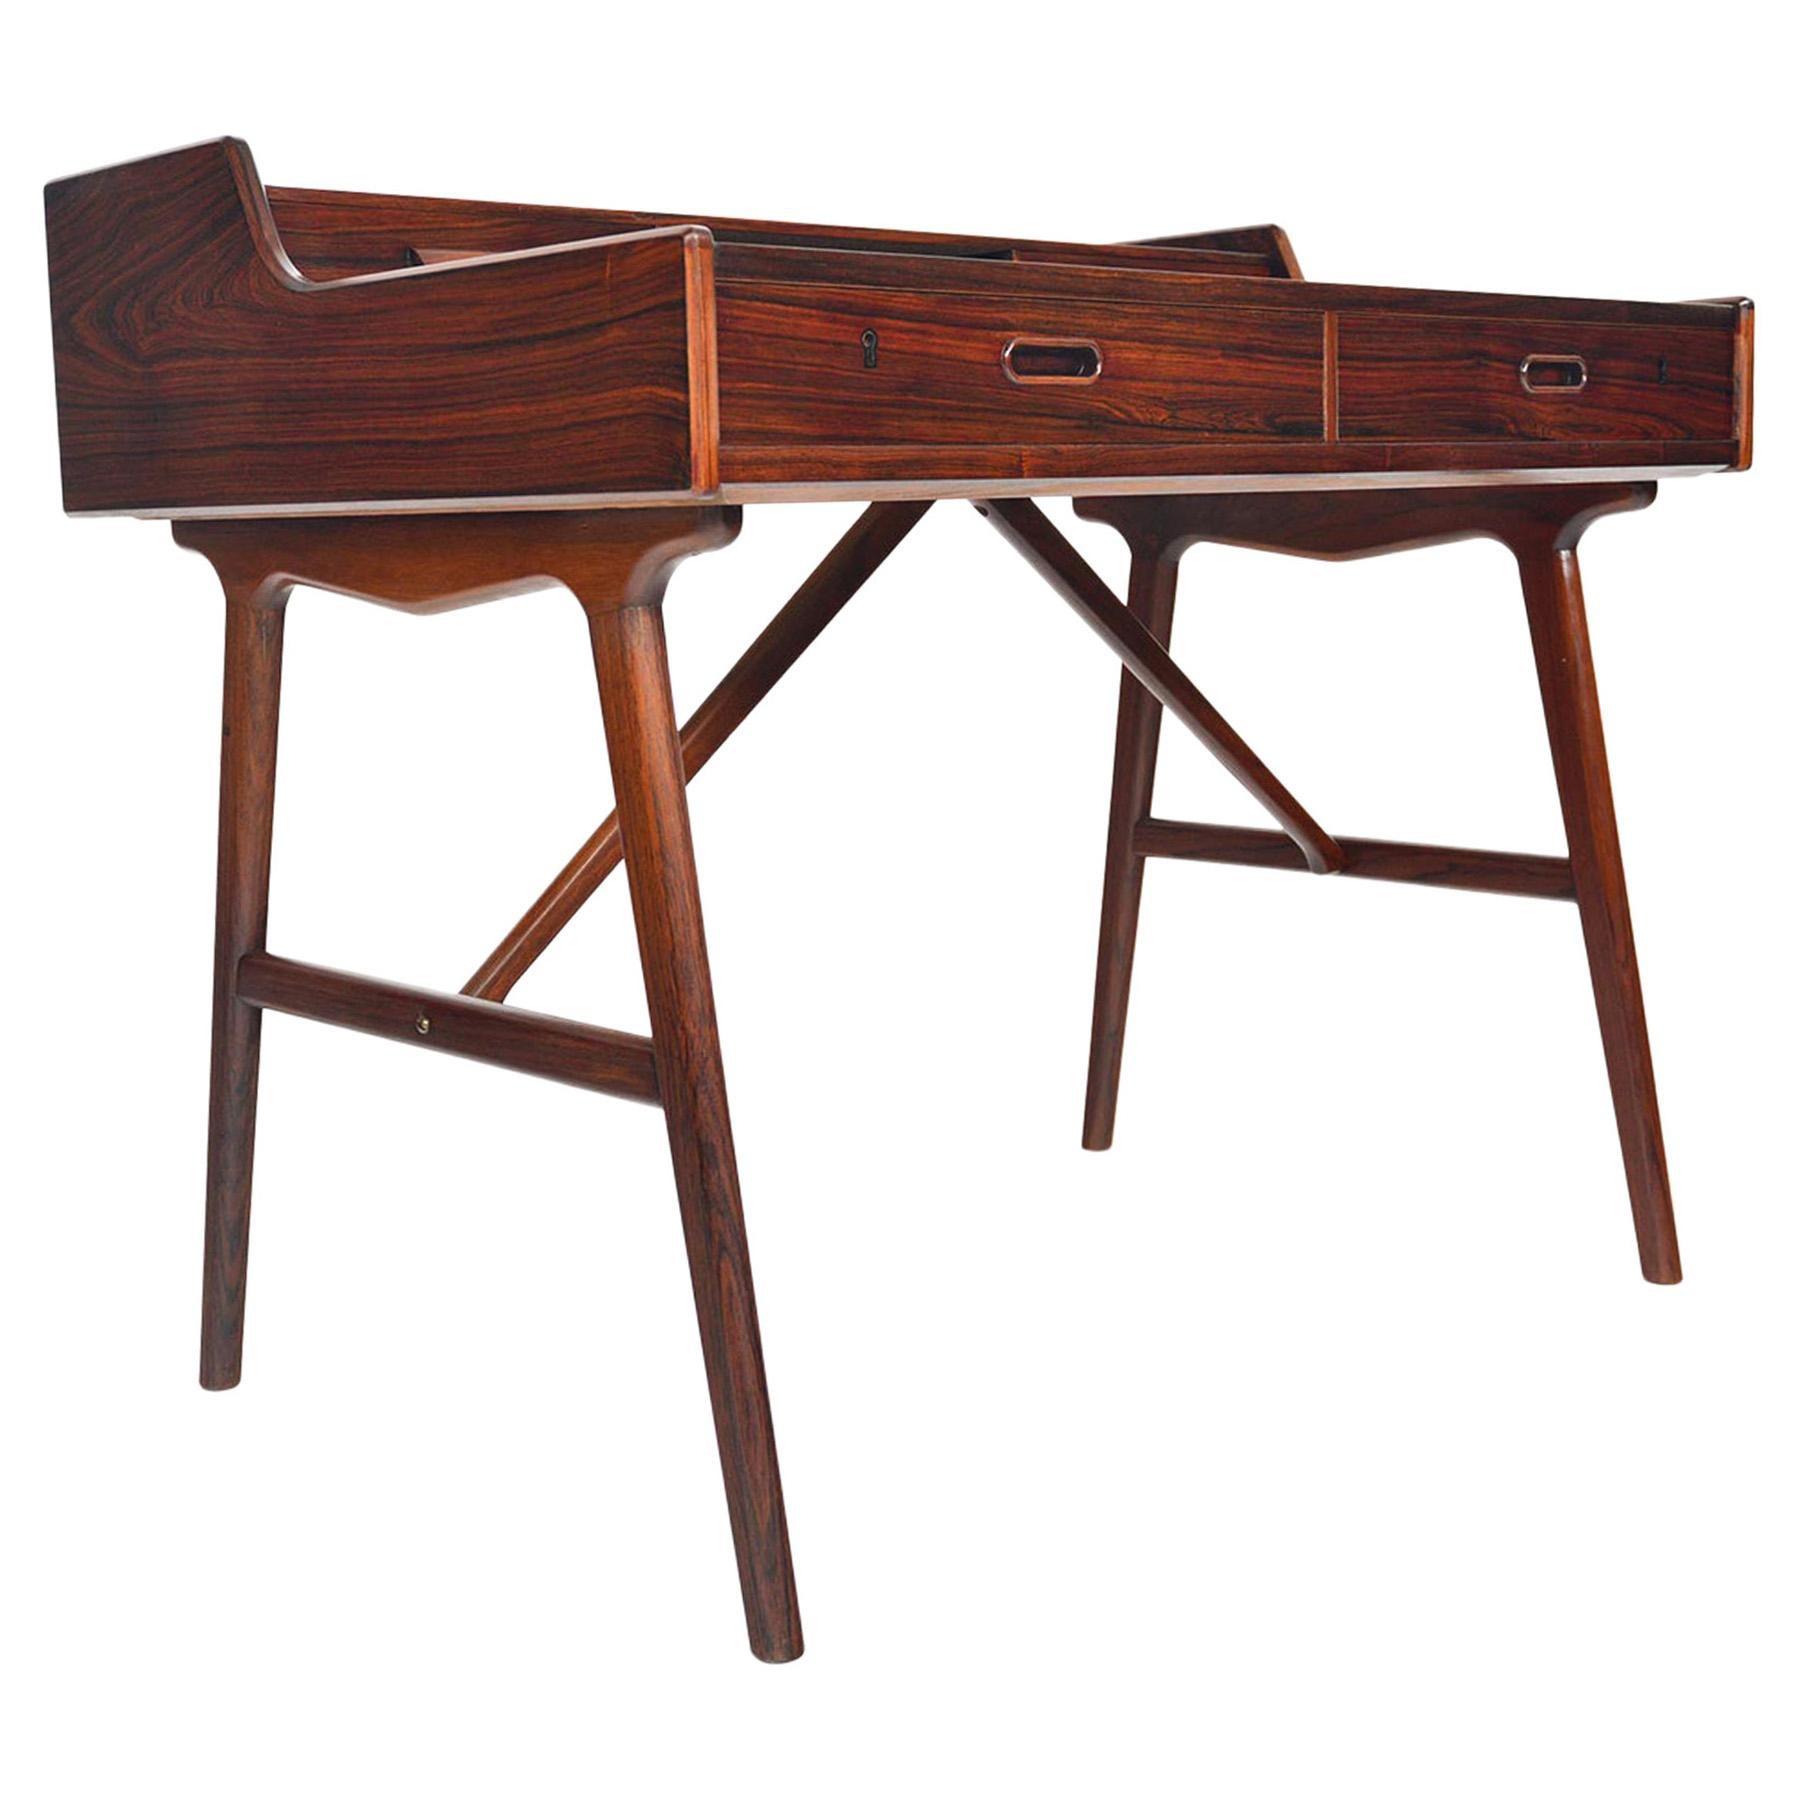 Arne Wahl Iversen Model 64 Desk in Rosewood